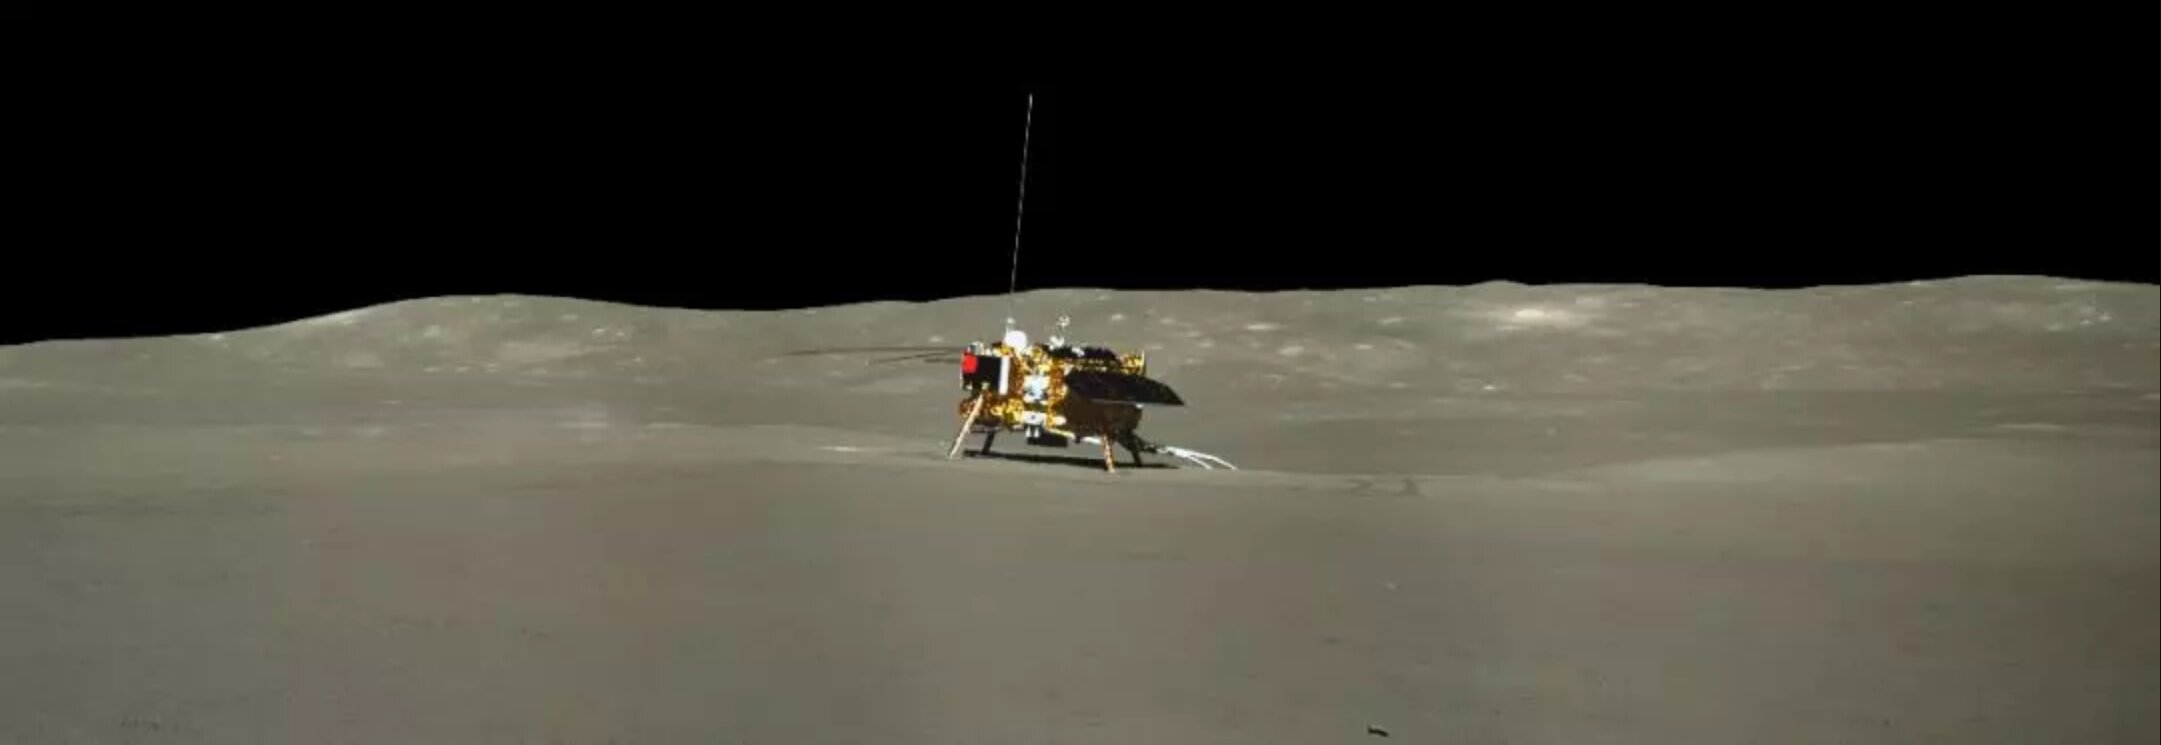 Image: Chang'e-4 lander